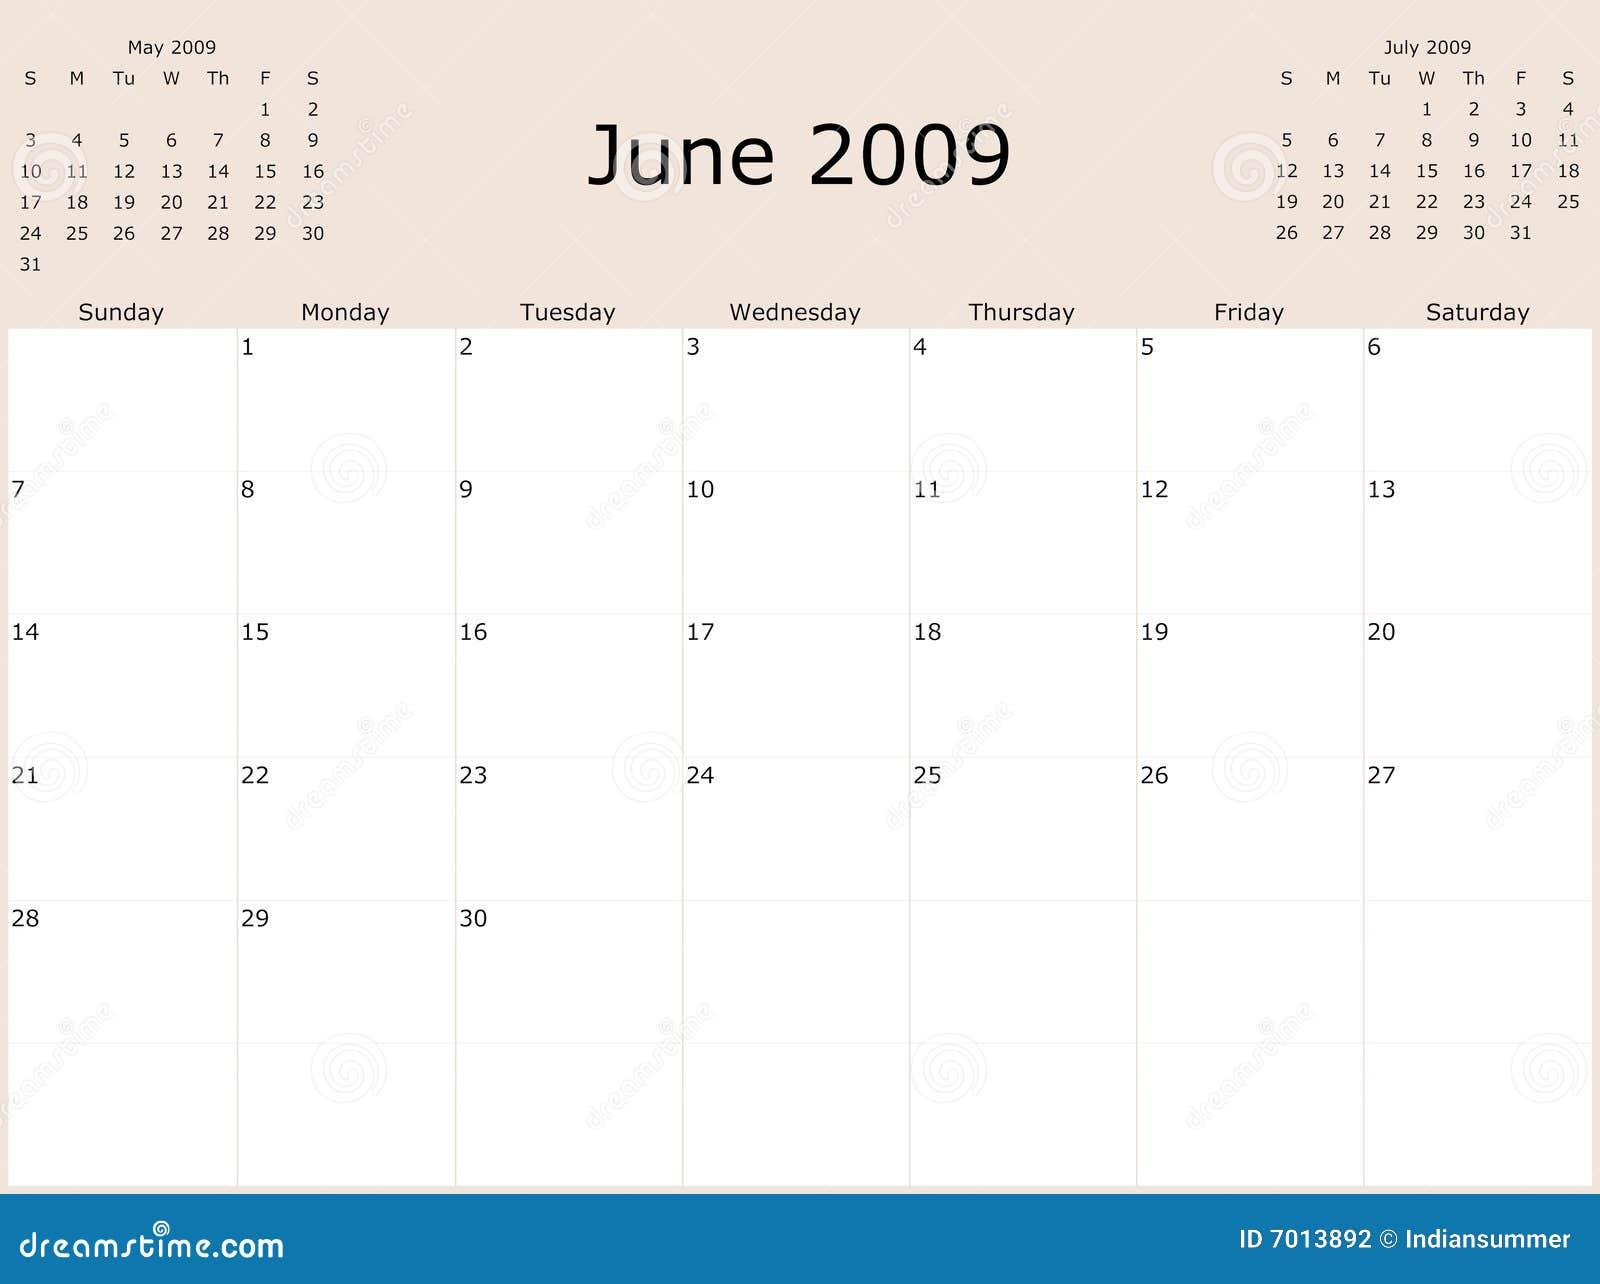 List of gujarati calendar 2009 2018 calendars printing.